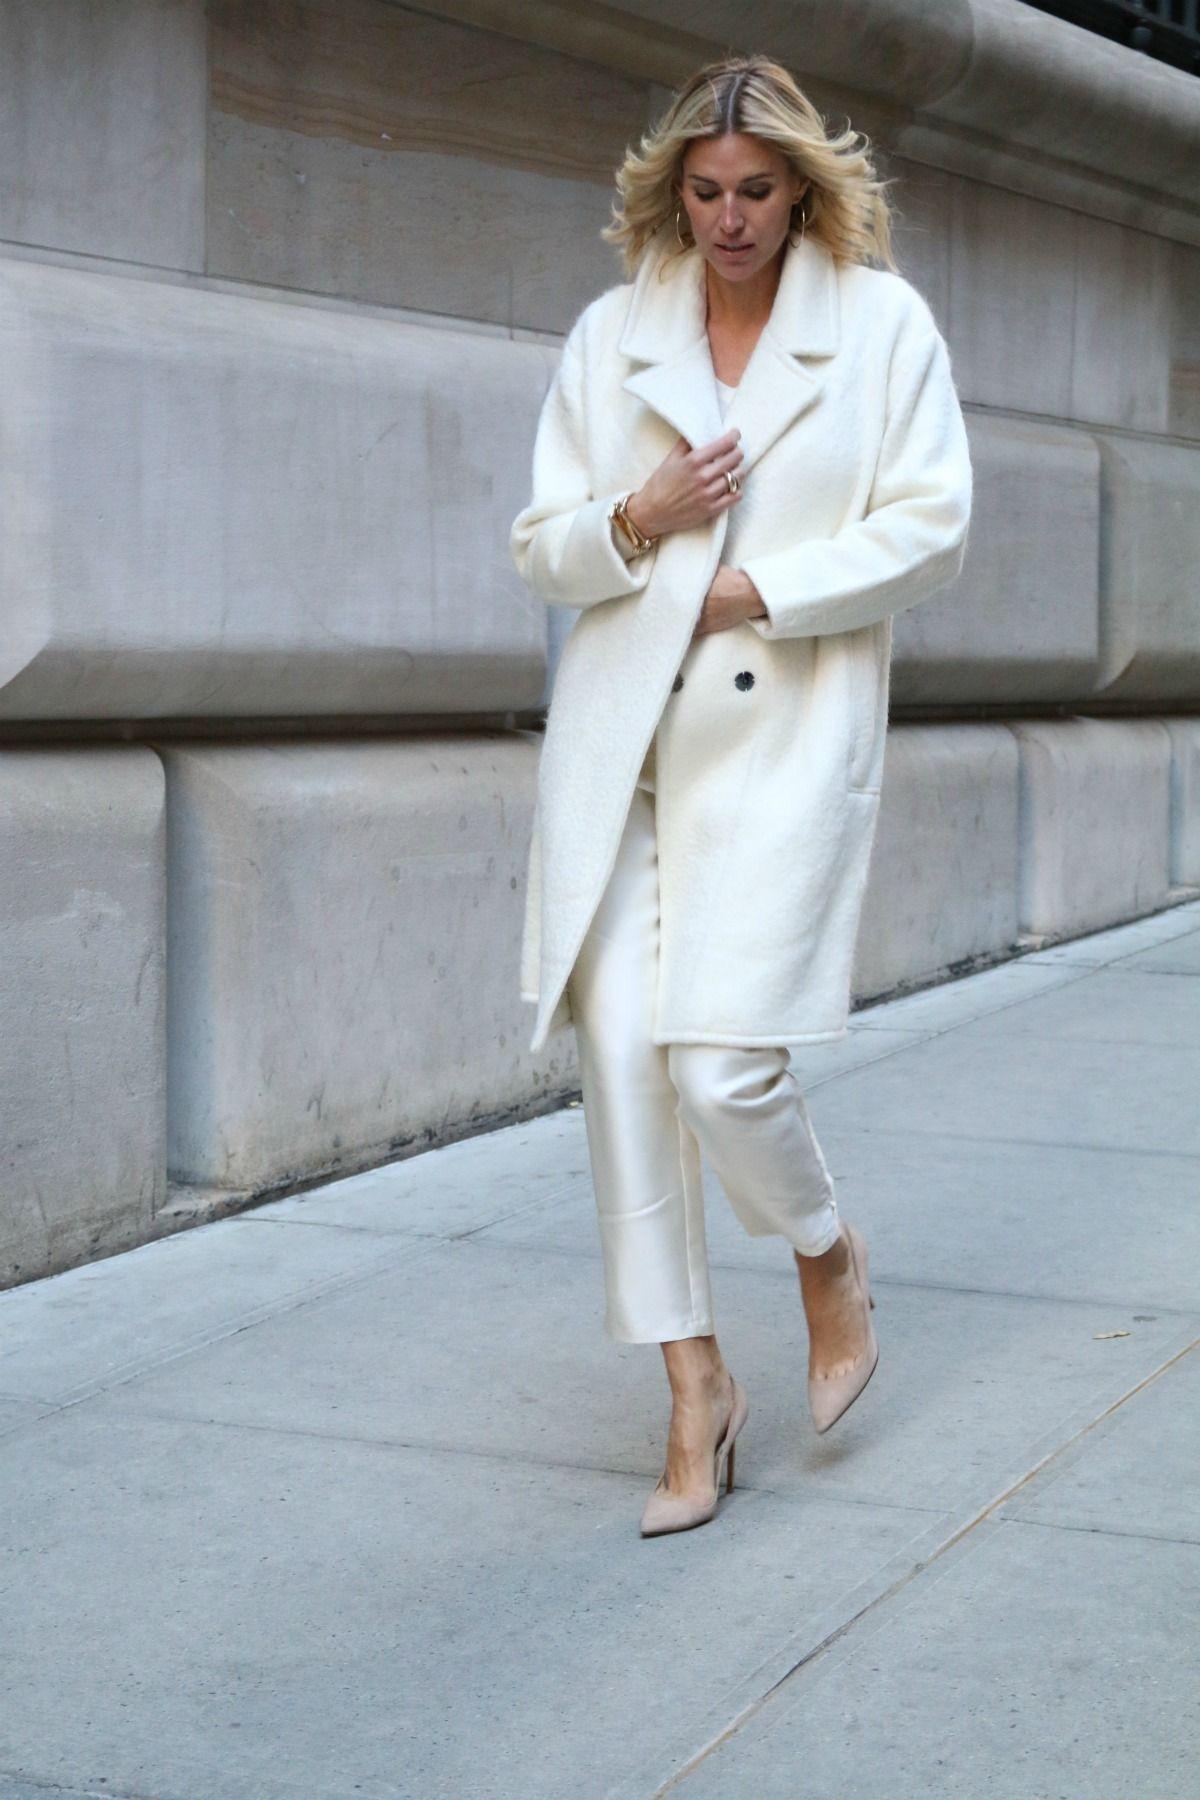 Winter White Debunking The Myth Fashion Luxury Winter White Outfit White Coat Outfit White Winter Coat [ 1800 x 1200 Pixel ]